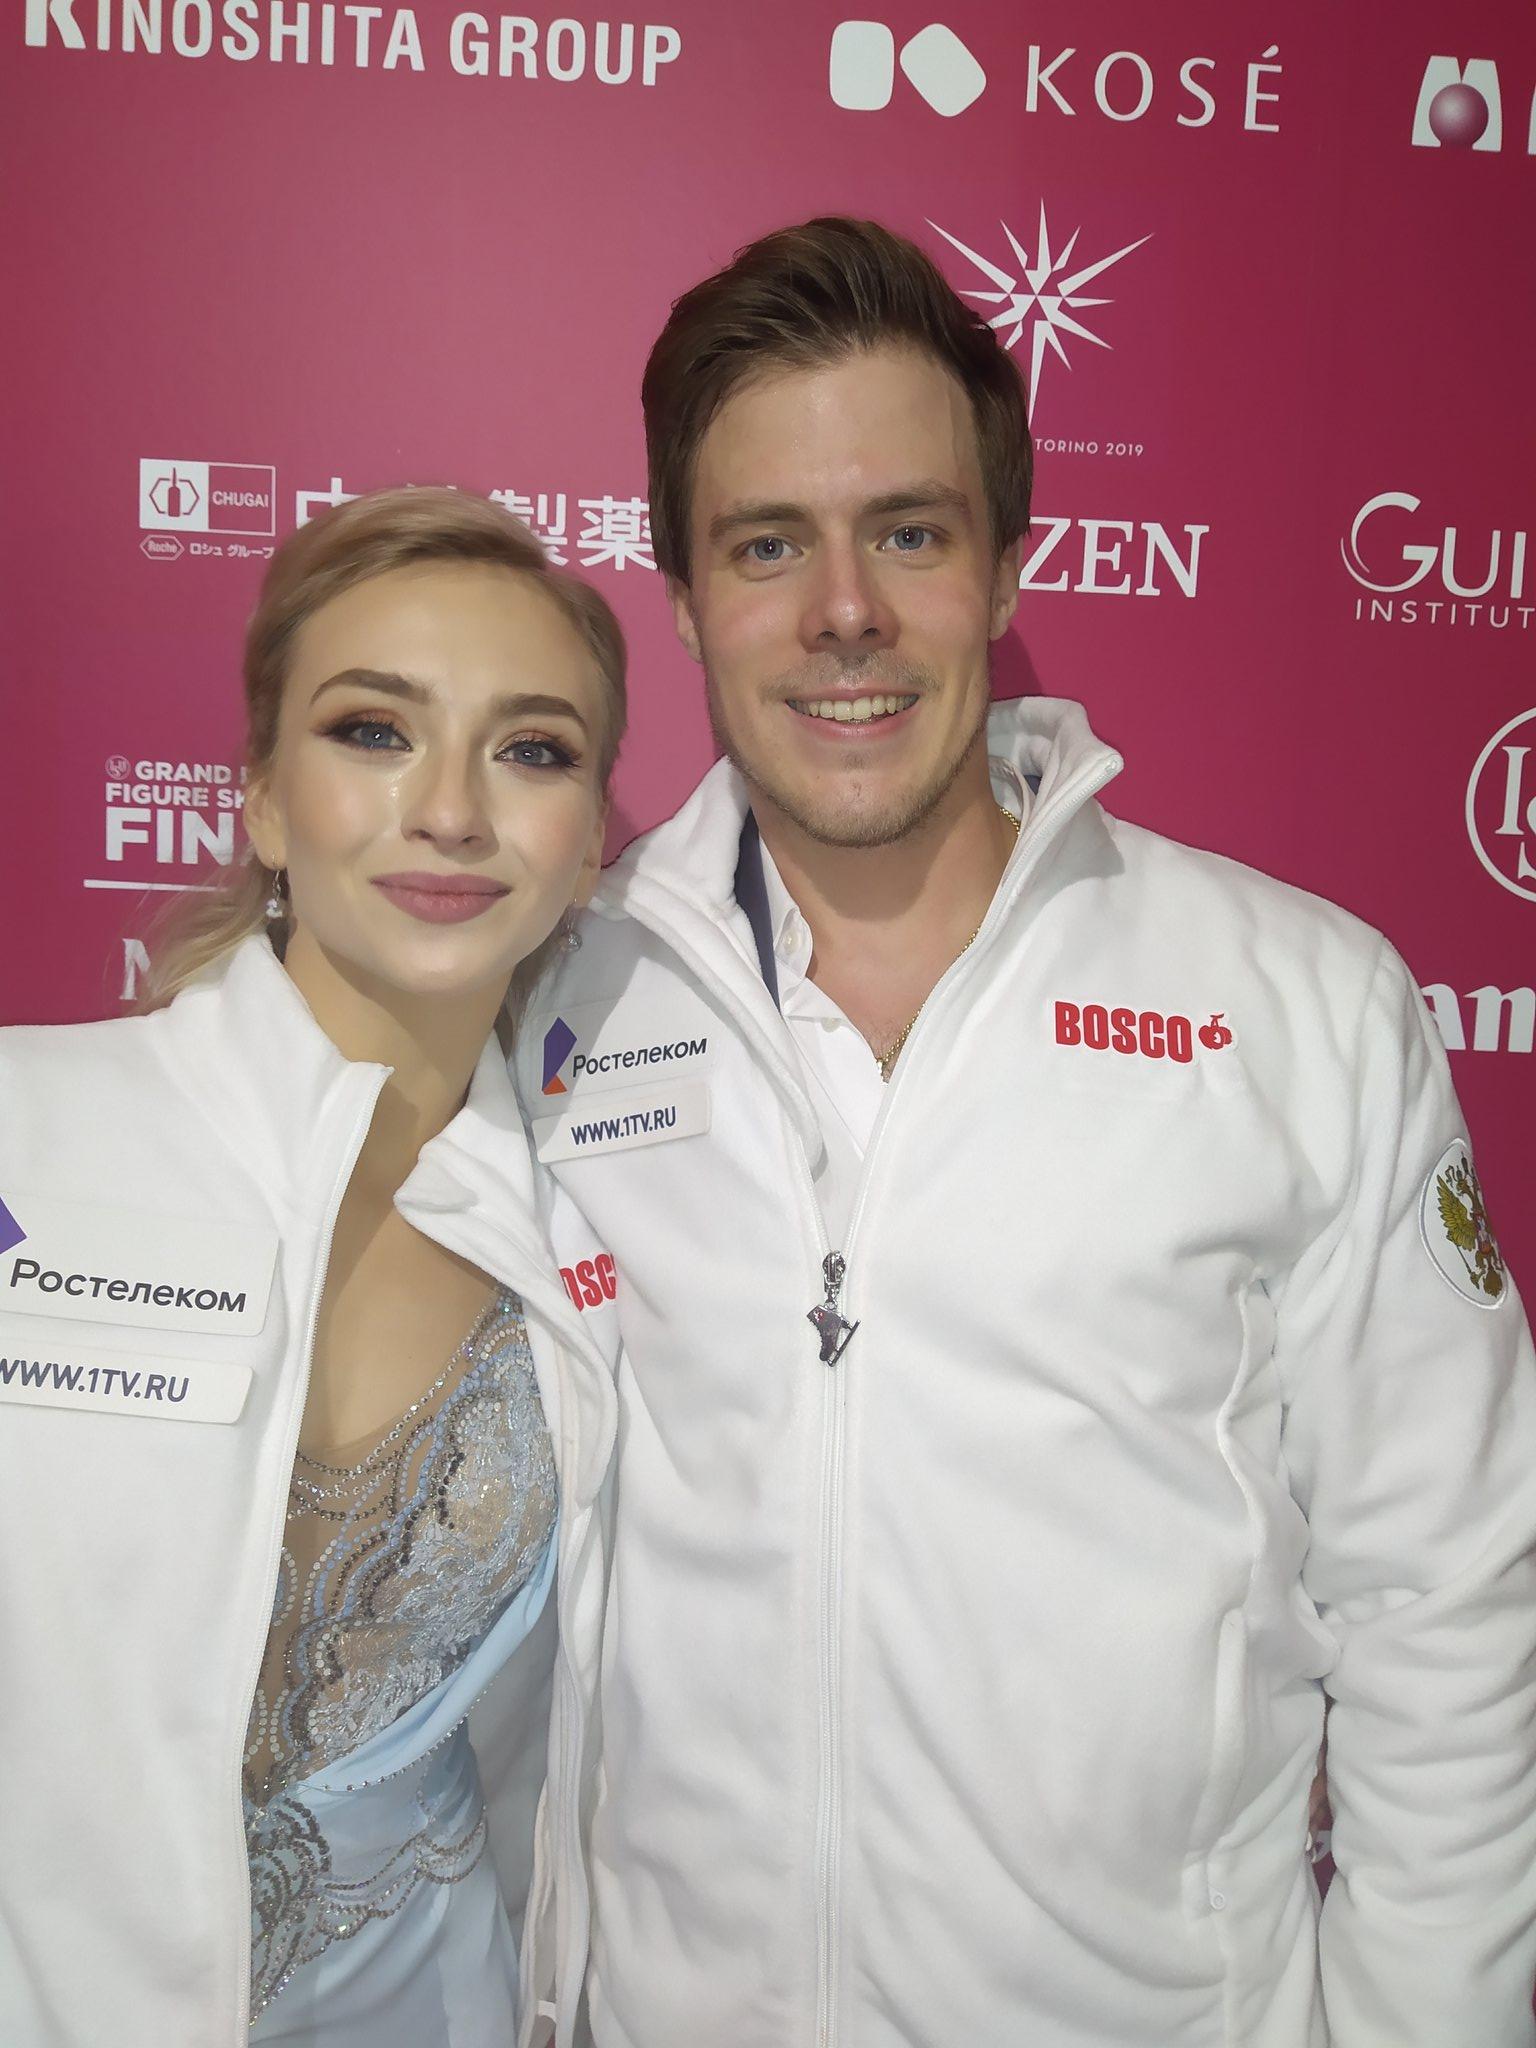 ISU Grand Prix of Figure Skating Final (Senior & Junior). Dec 05 - Dec 08, 2019.  Torino /ITA  - Страница 17 ELH4pzhXsAAwkqV?format=jpg&name=4096x4096